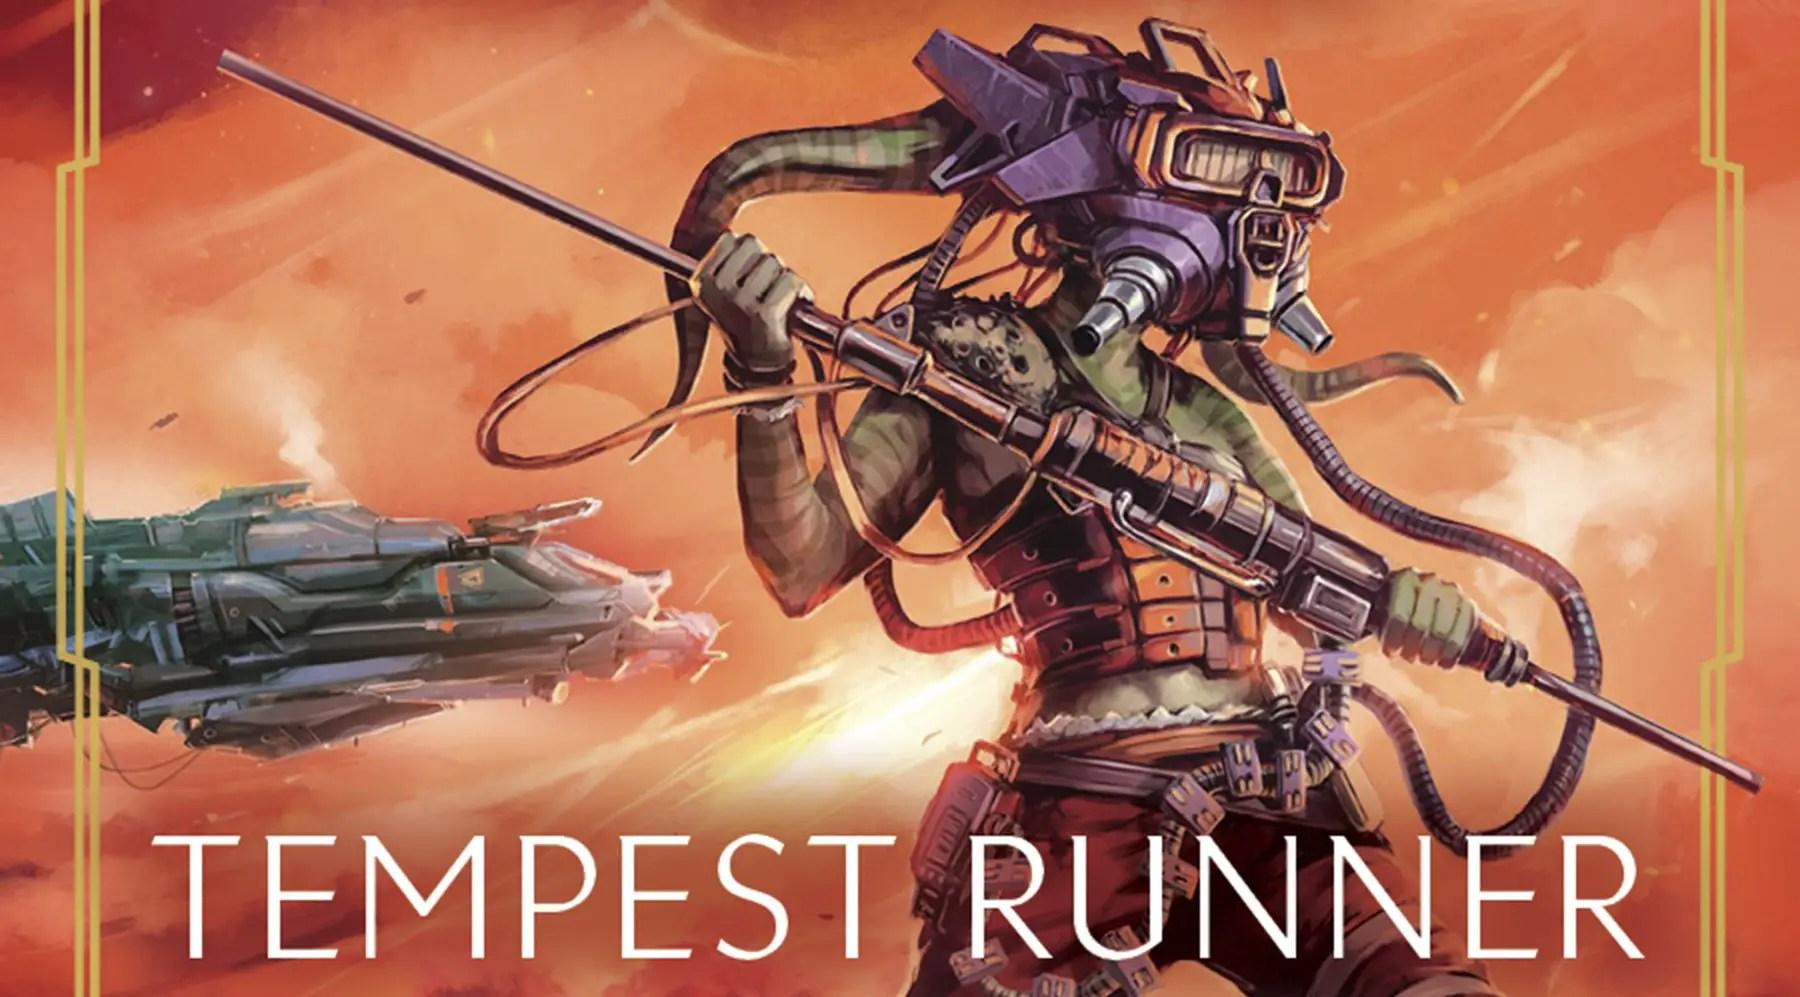 Star Wars: Tempest Runner